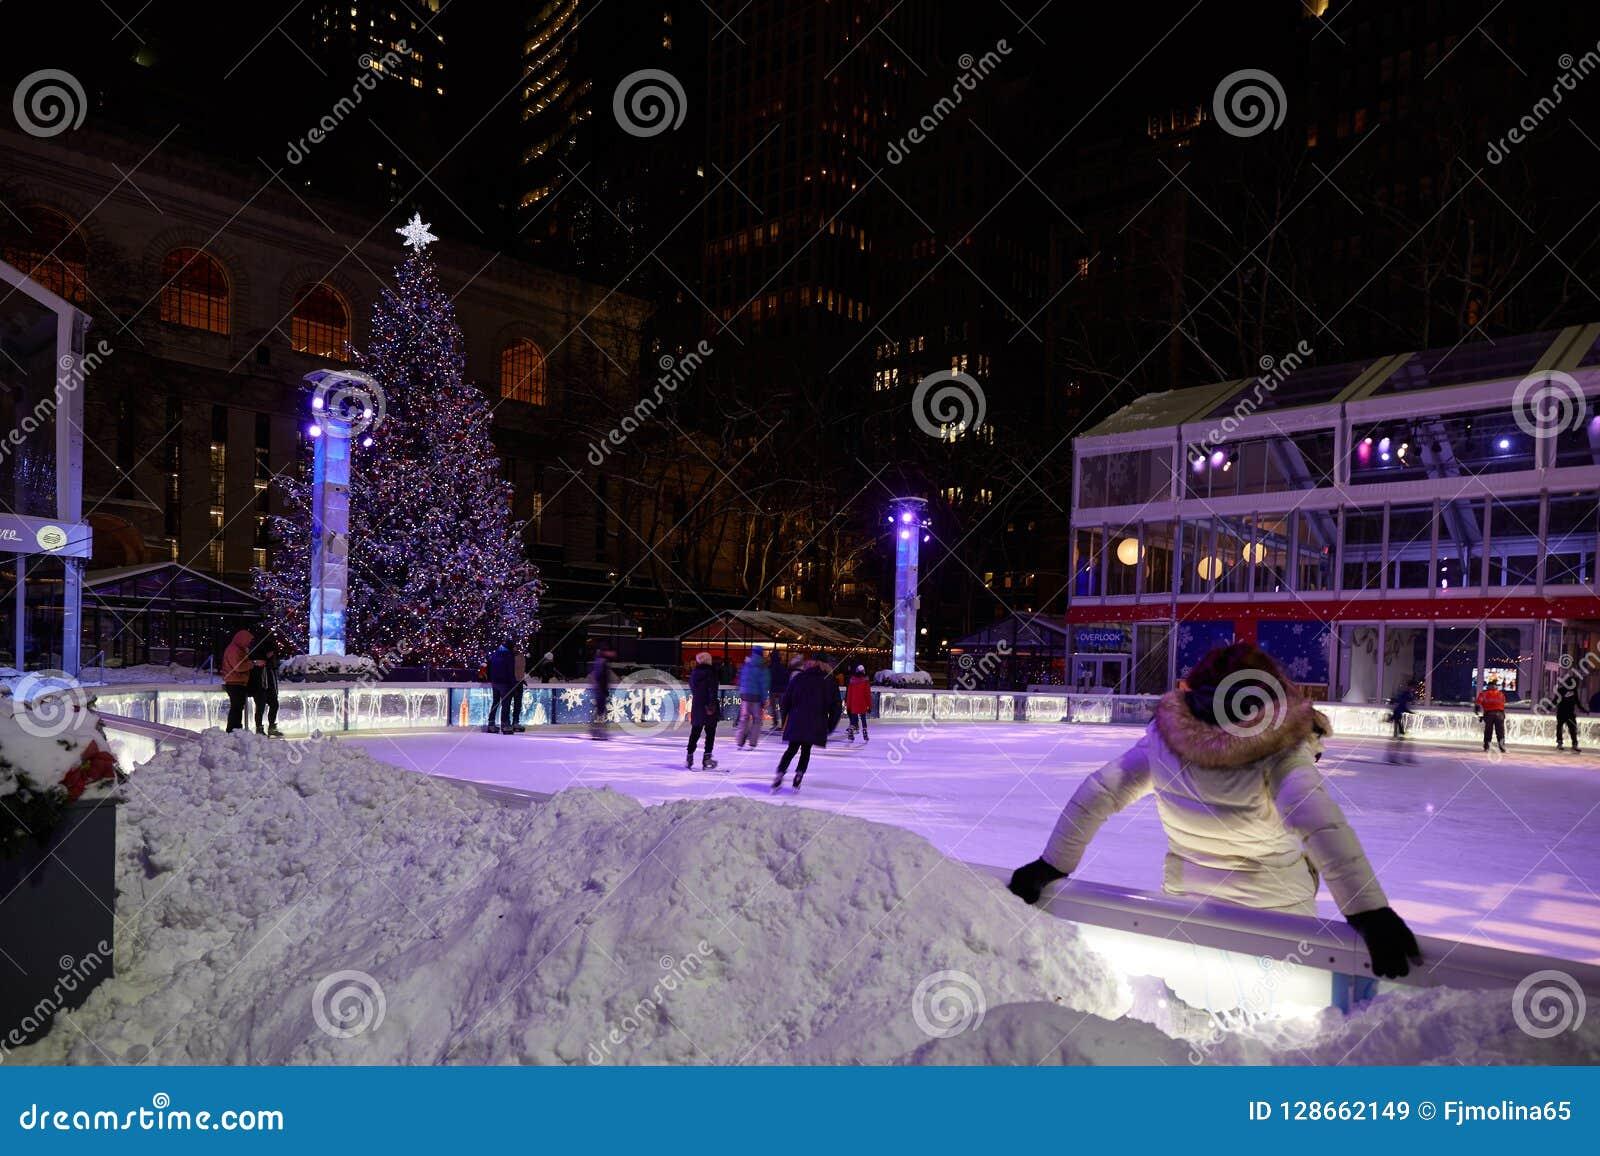 Bryant Park Christmas.Skating Rink In Bryant Park Manhattan Stock Image Image